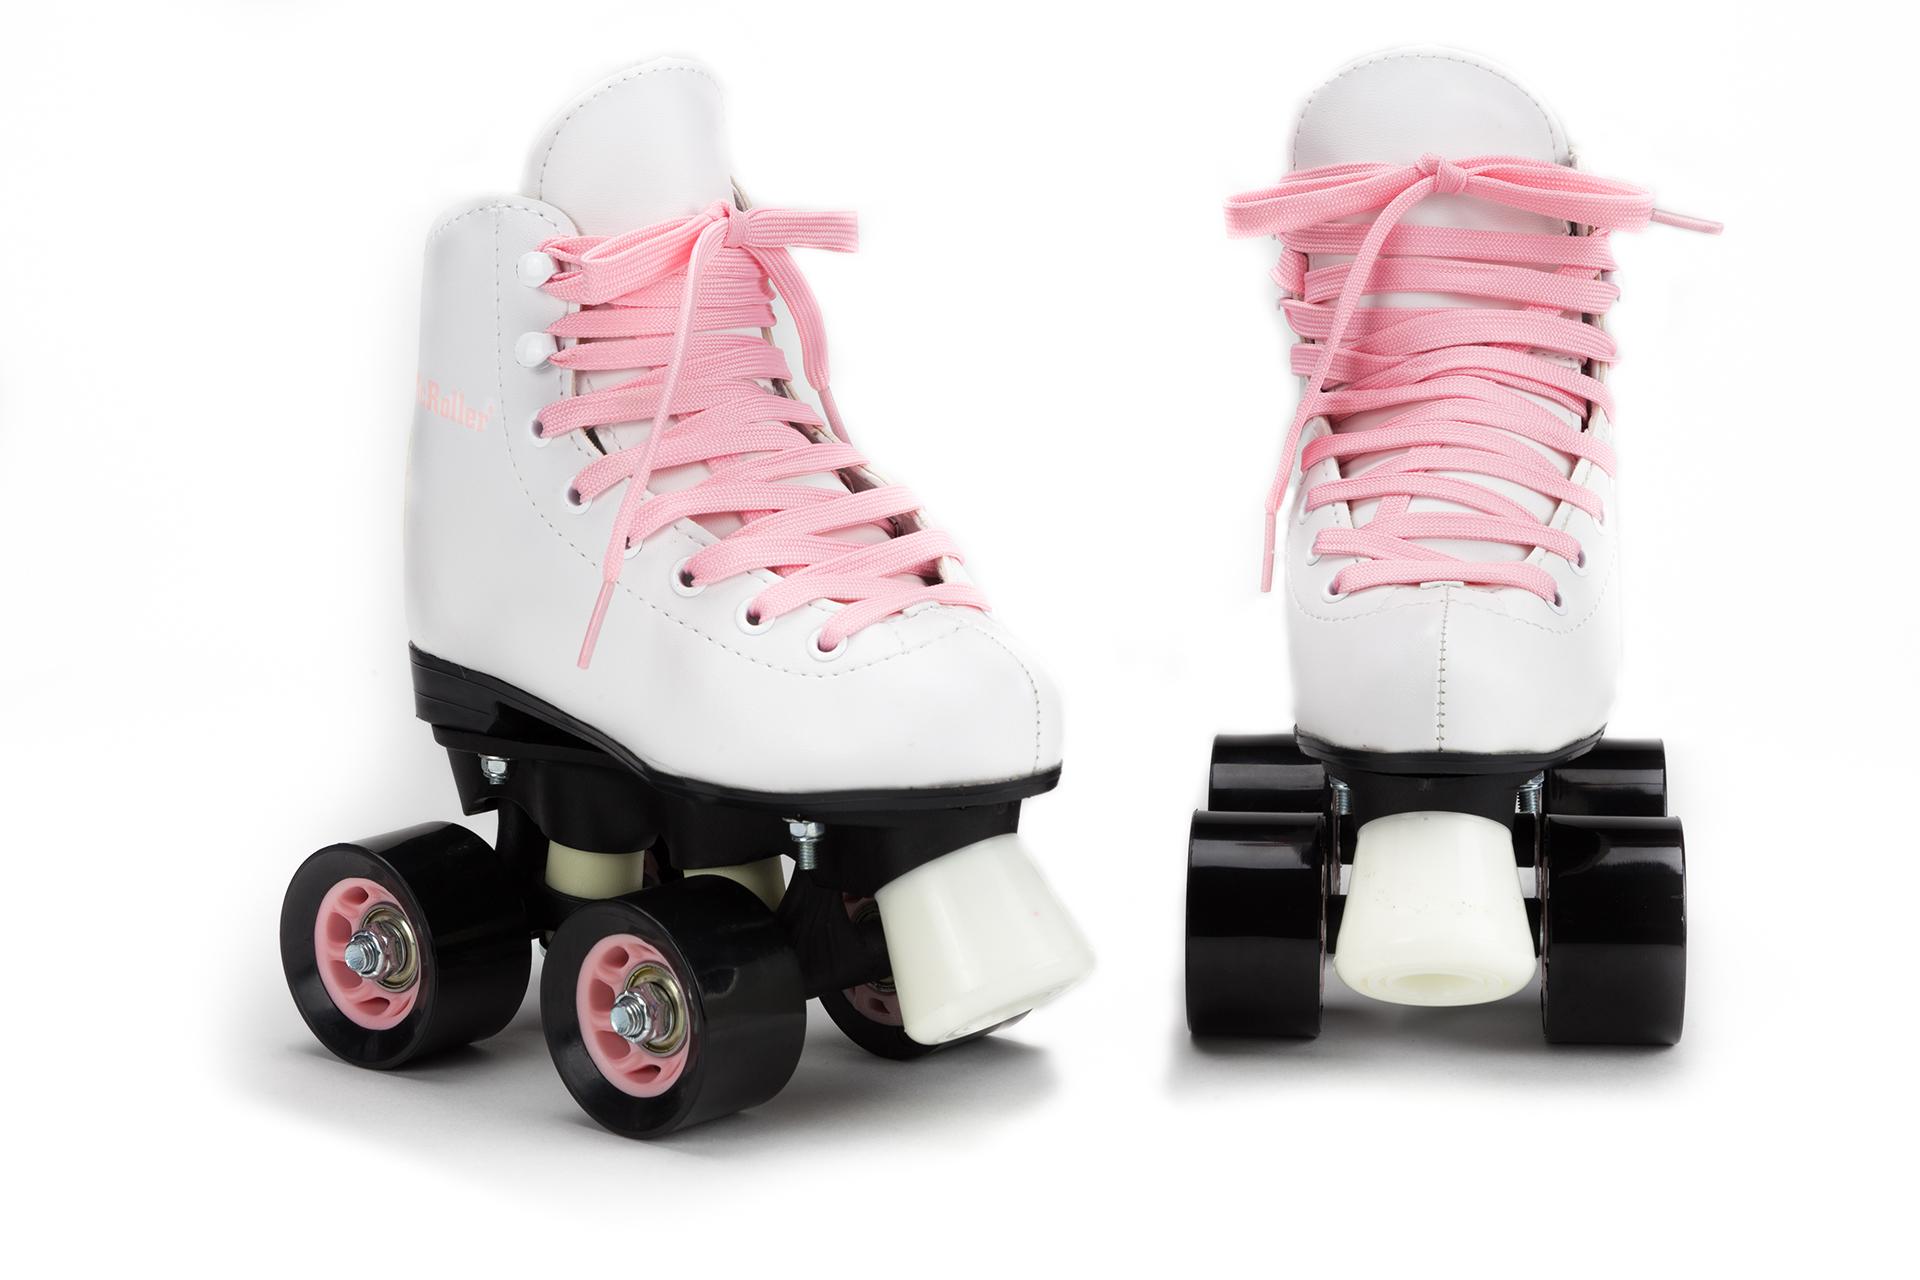 mcroller patines iniciacion patinaje artistico